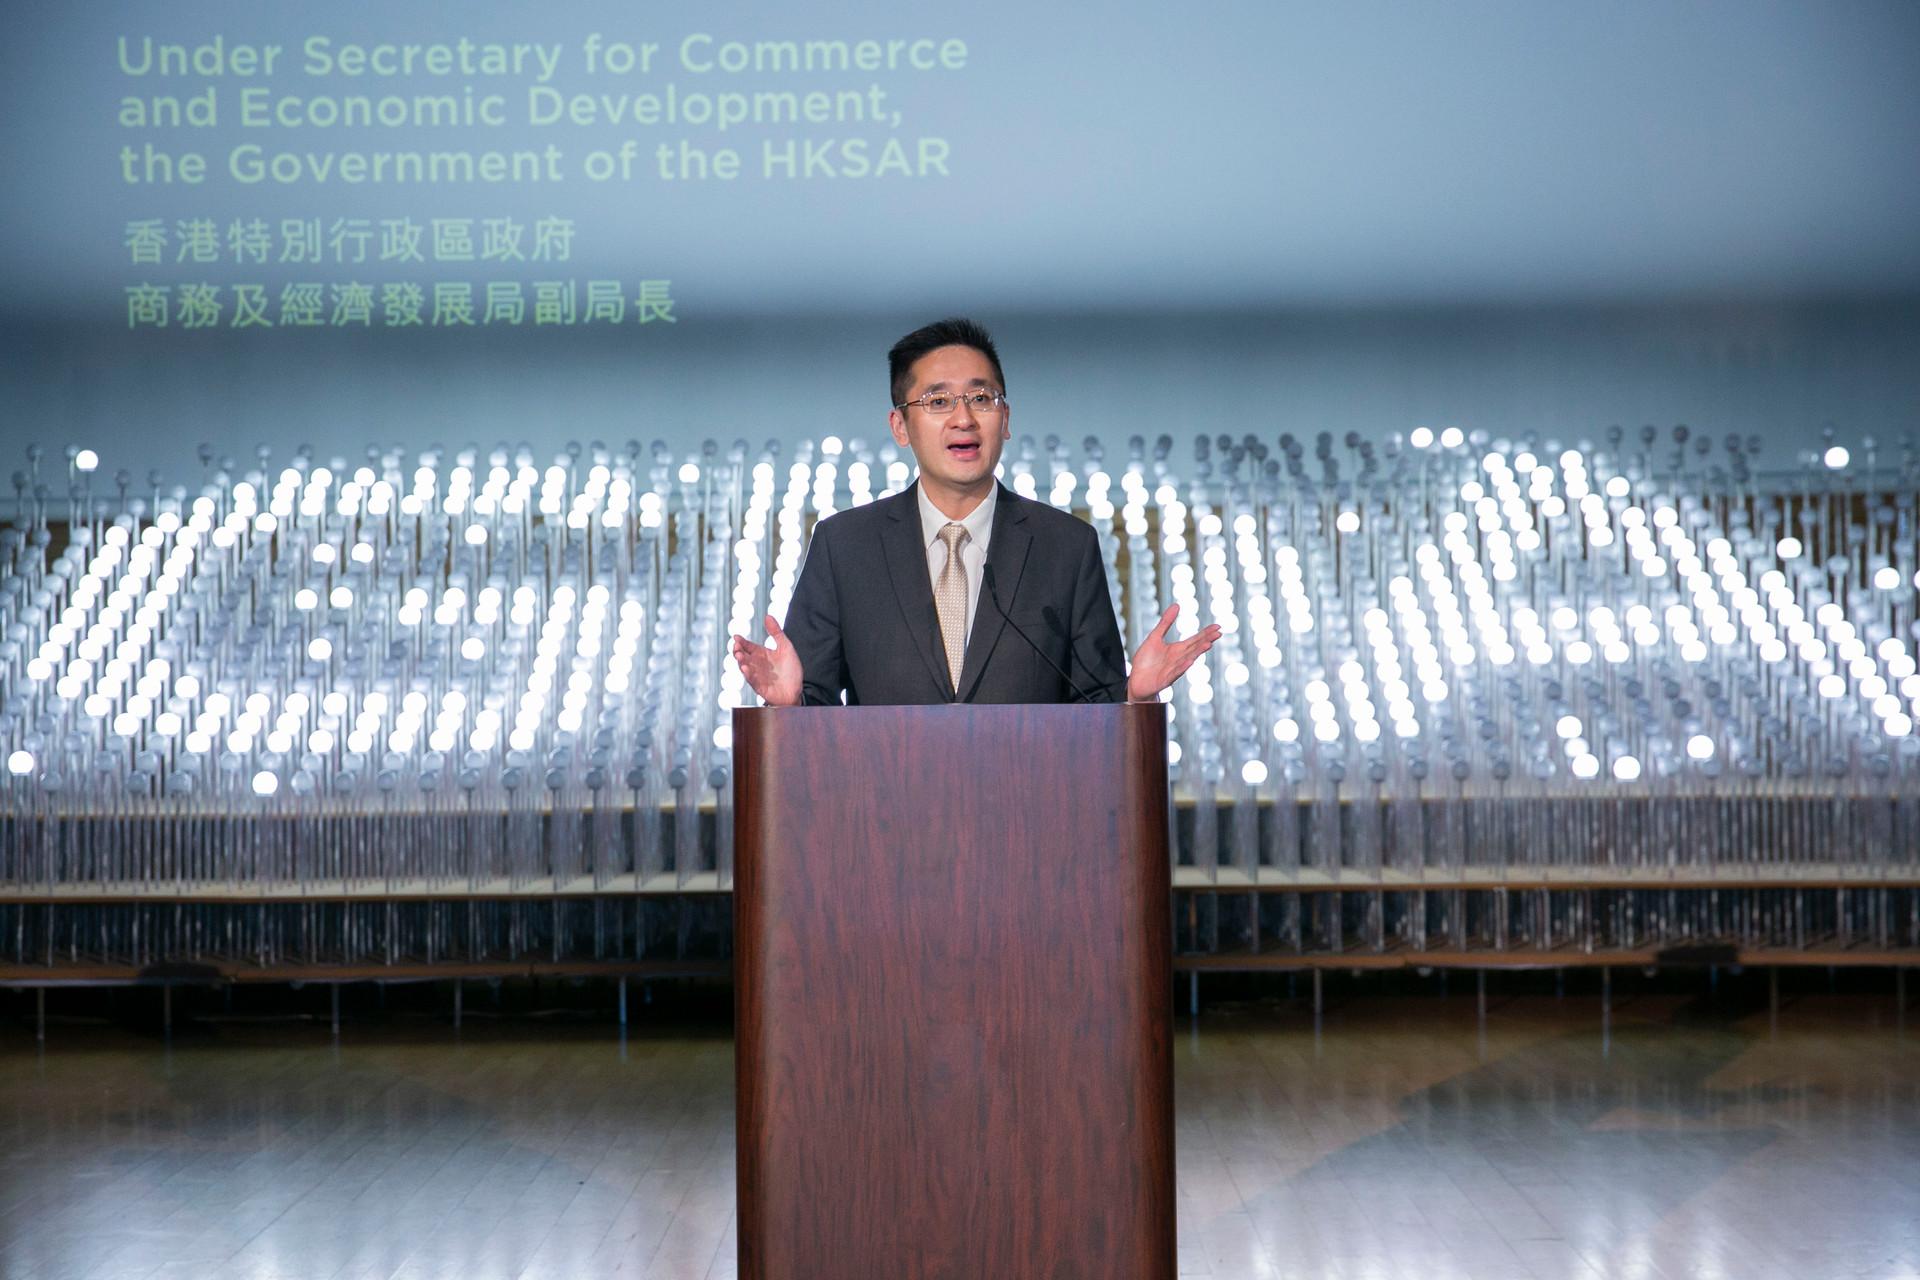 Asian men with brown wood podium in HKDA Global Design Awards